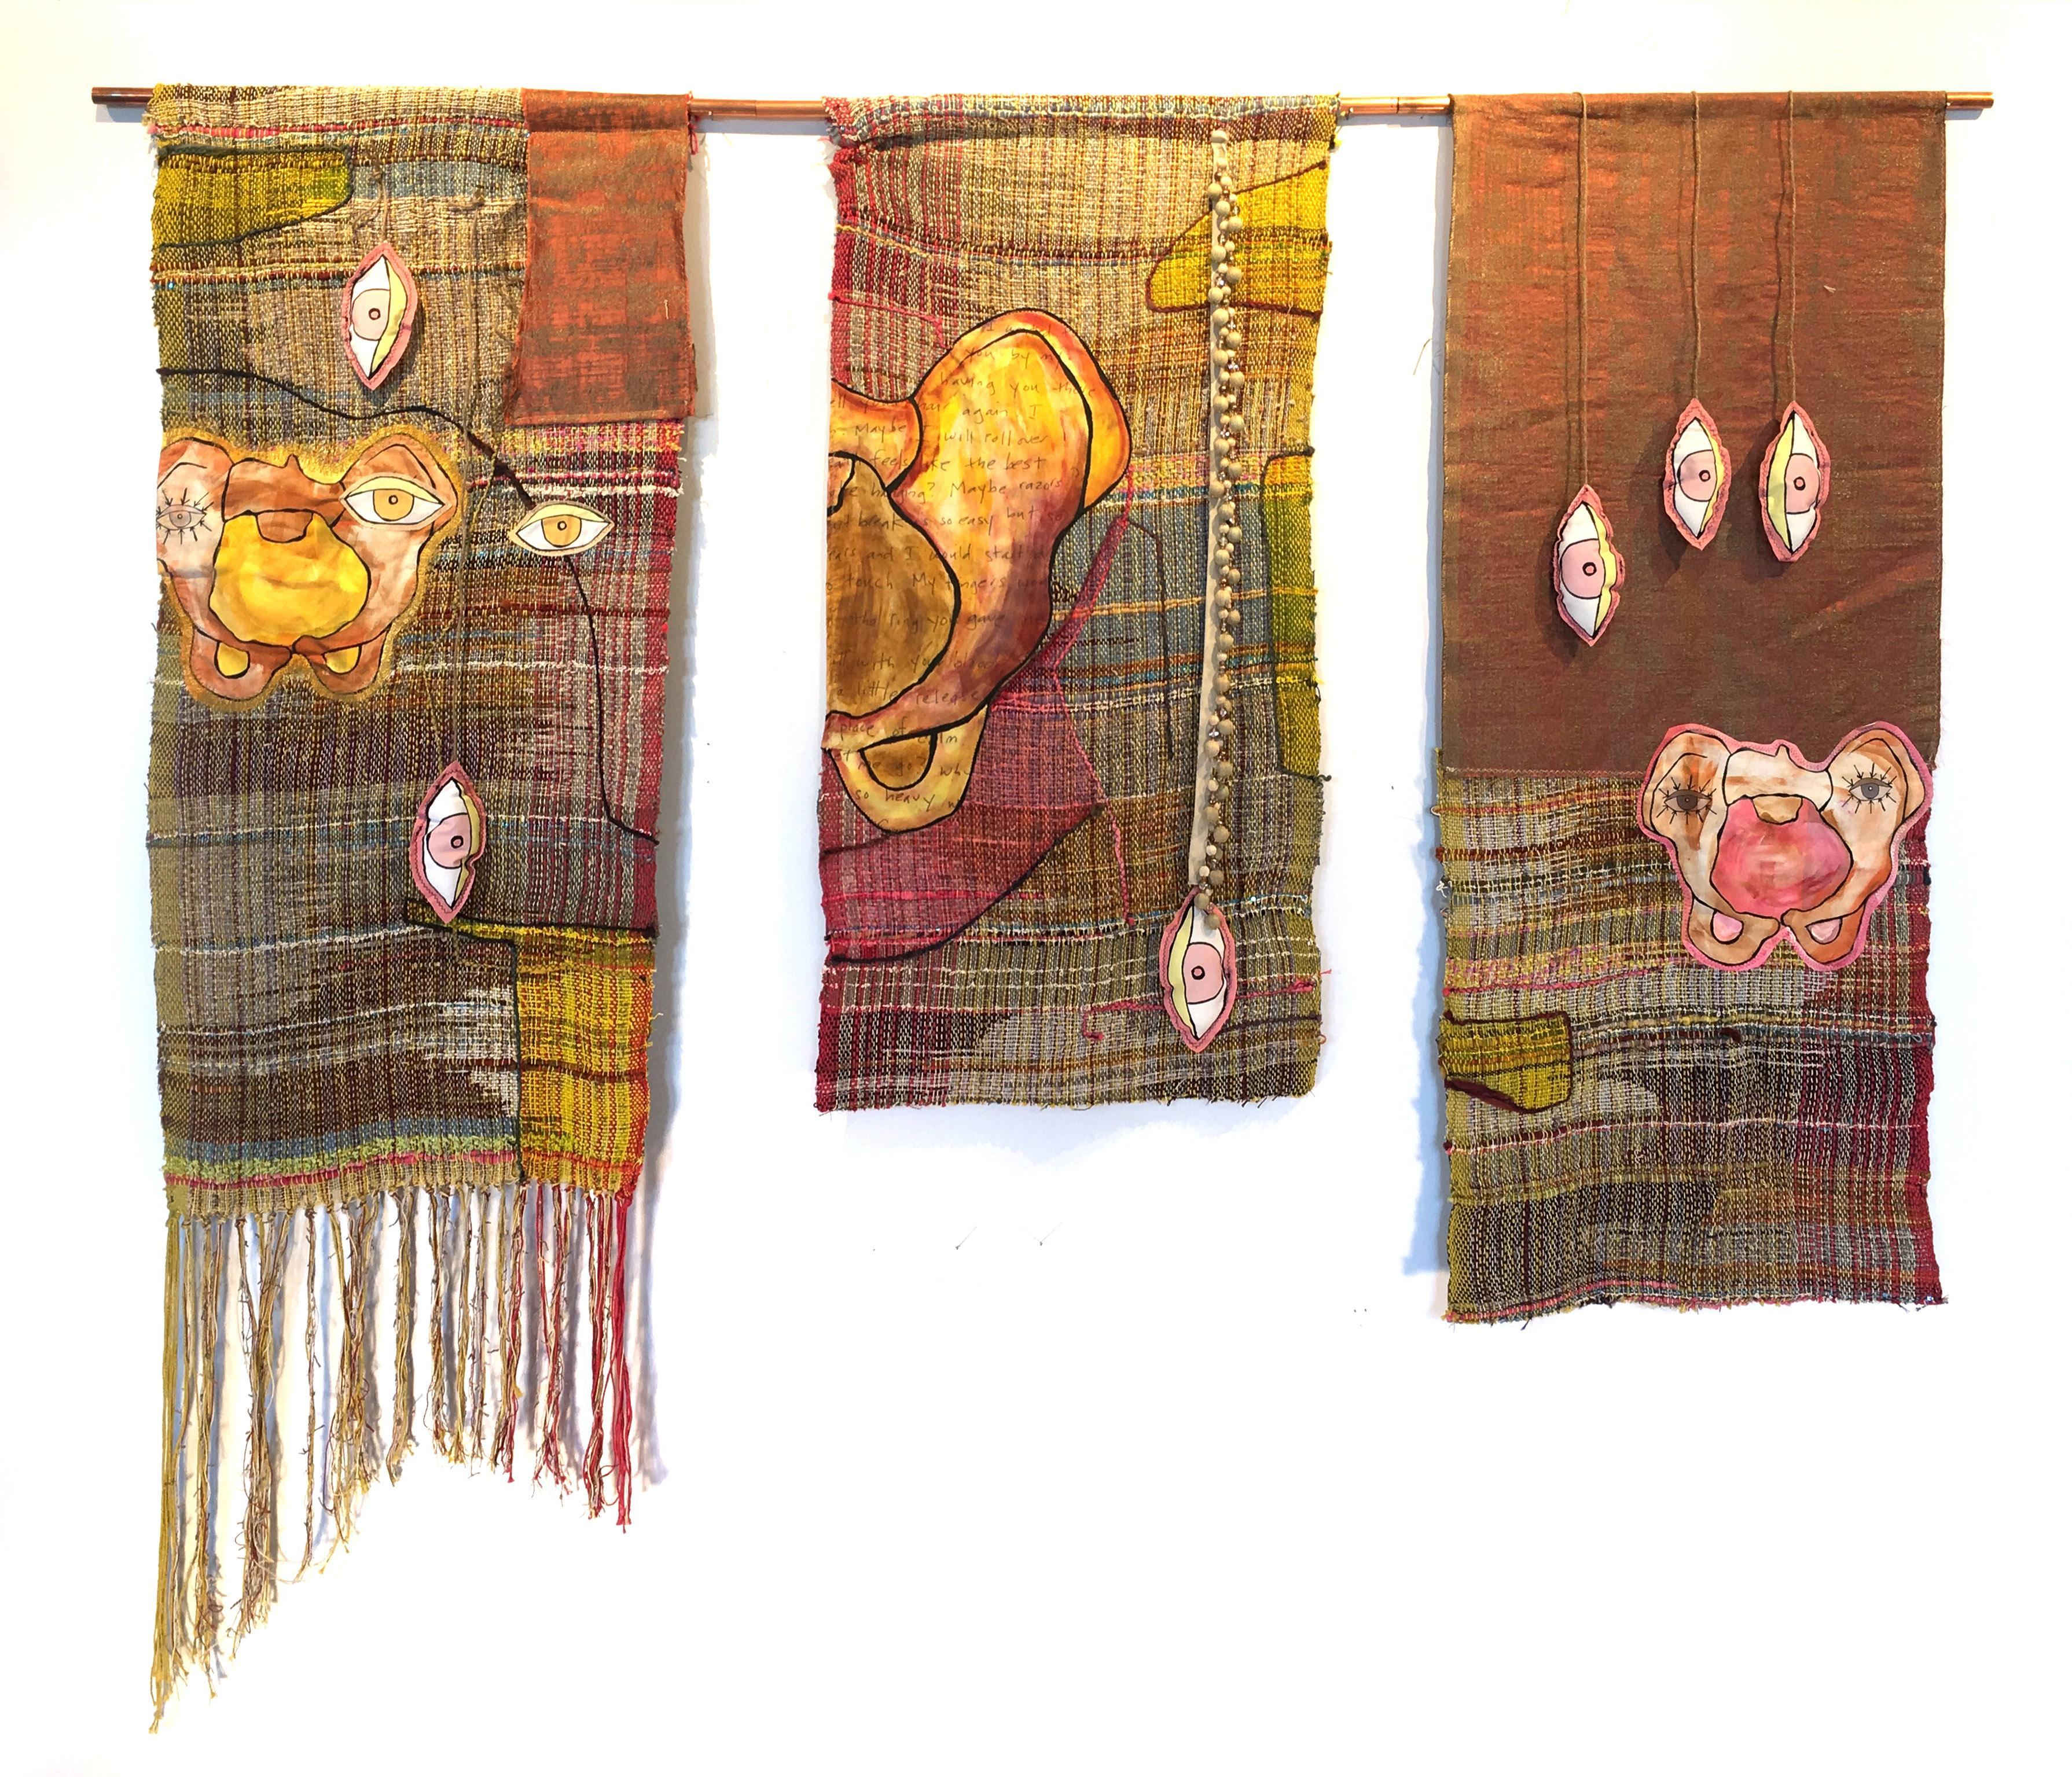 Textile Handwoven Wall Hanging: 'Pelvic Thrust'